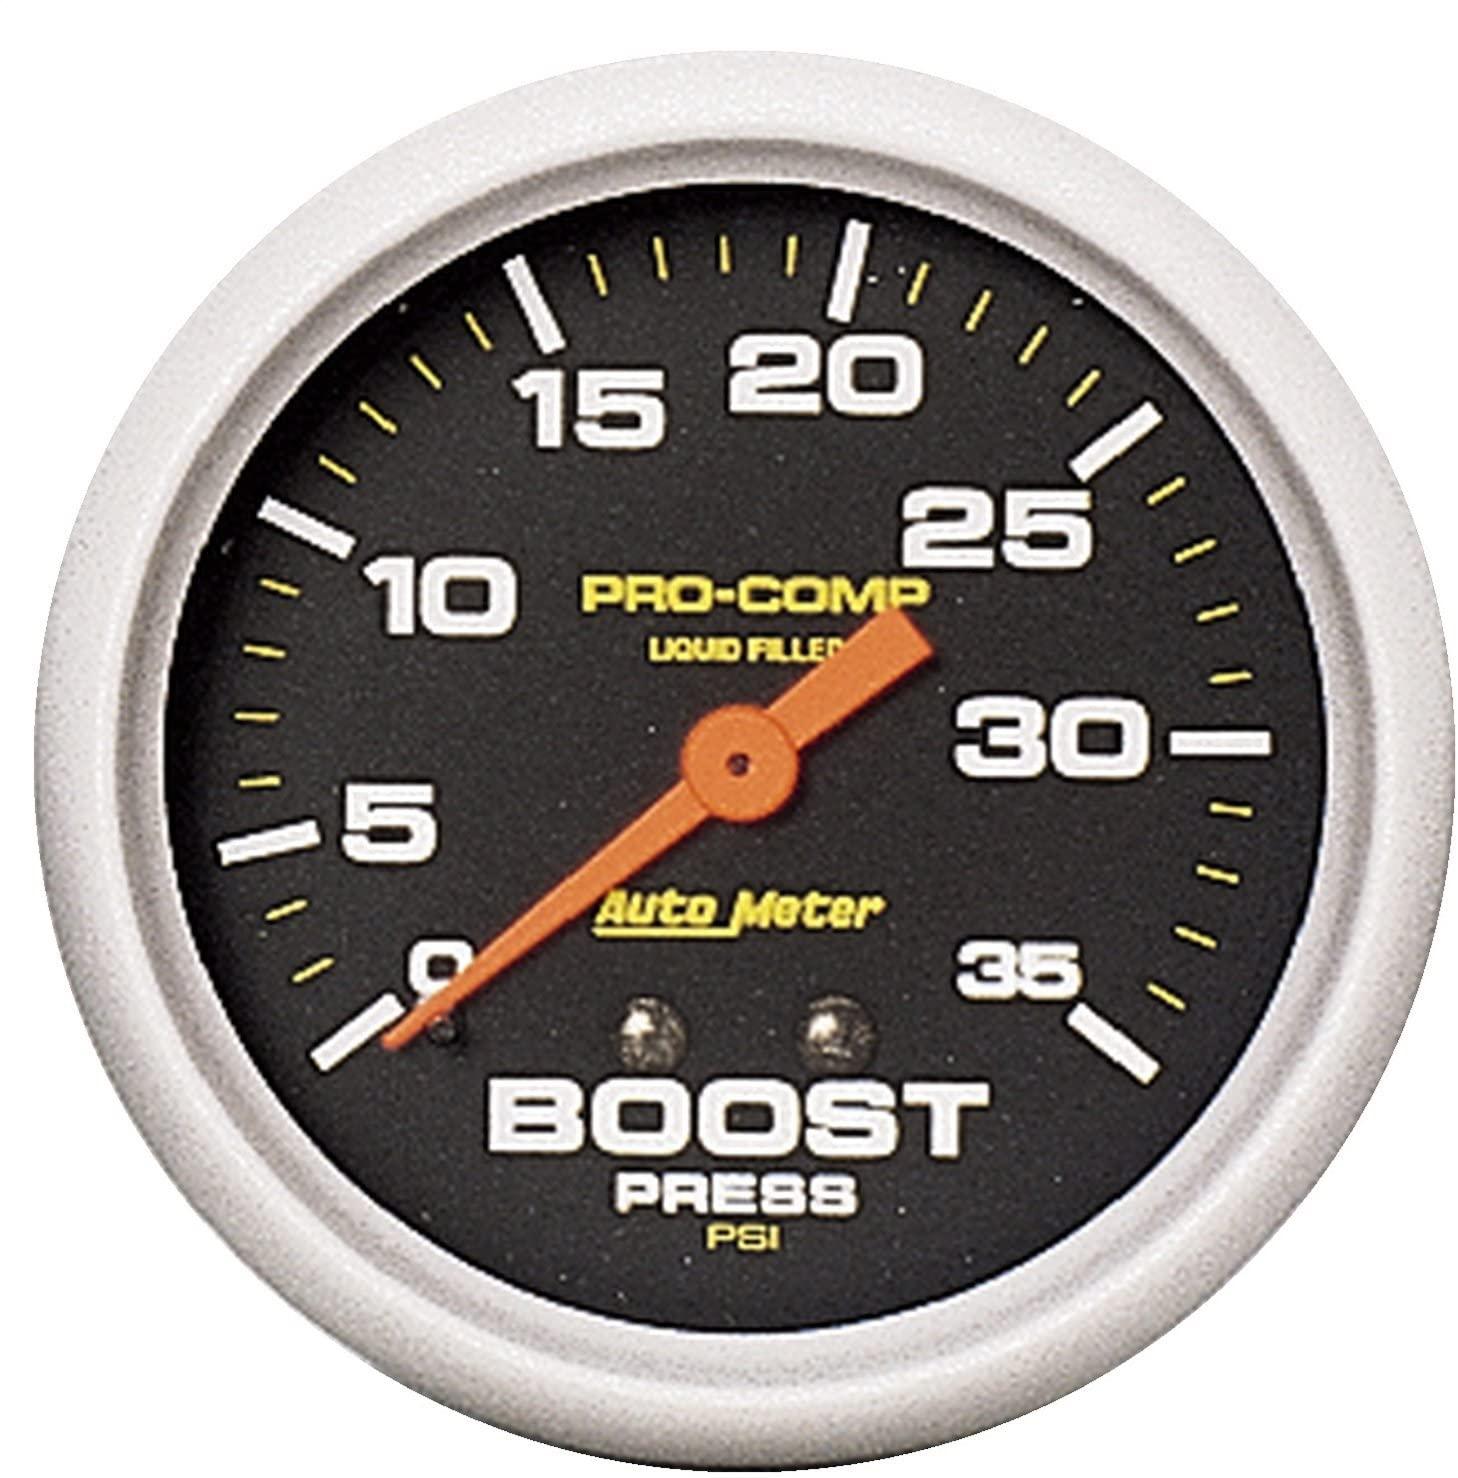 Auto Meter 5404 Pro-Comp Liquid-Filled Mechanical Boost Gauge